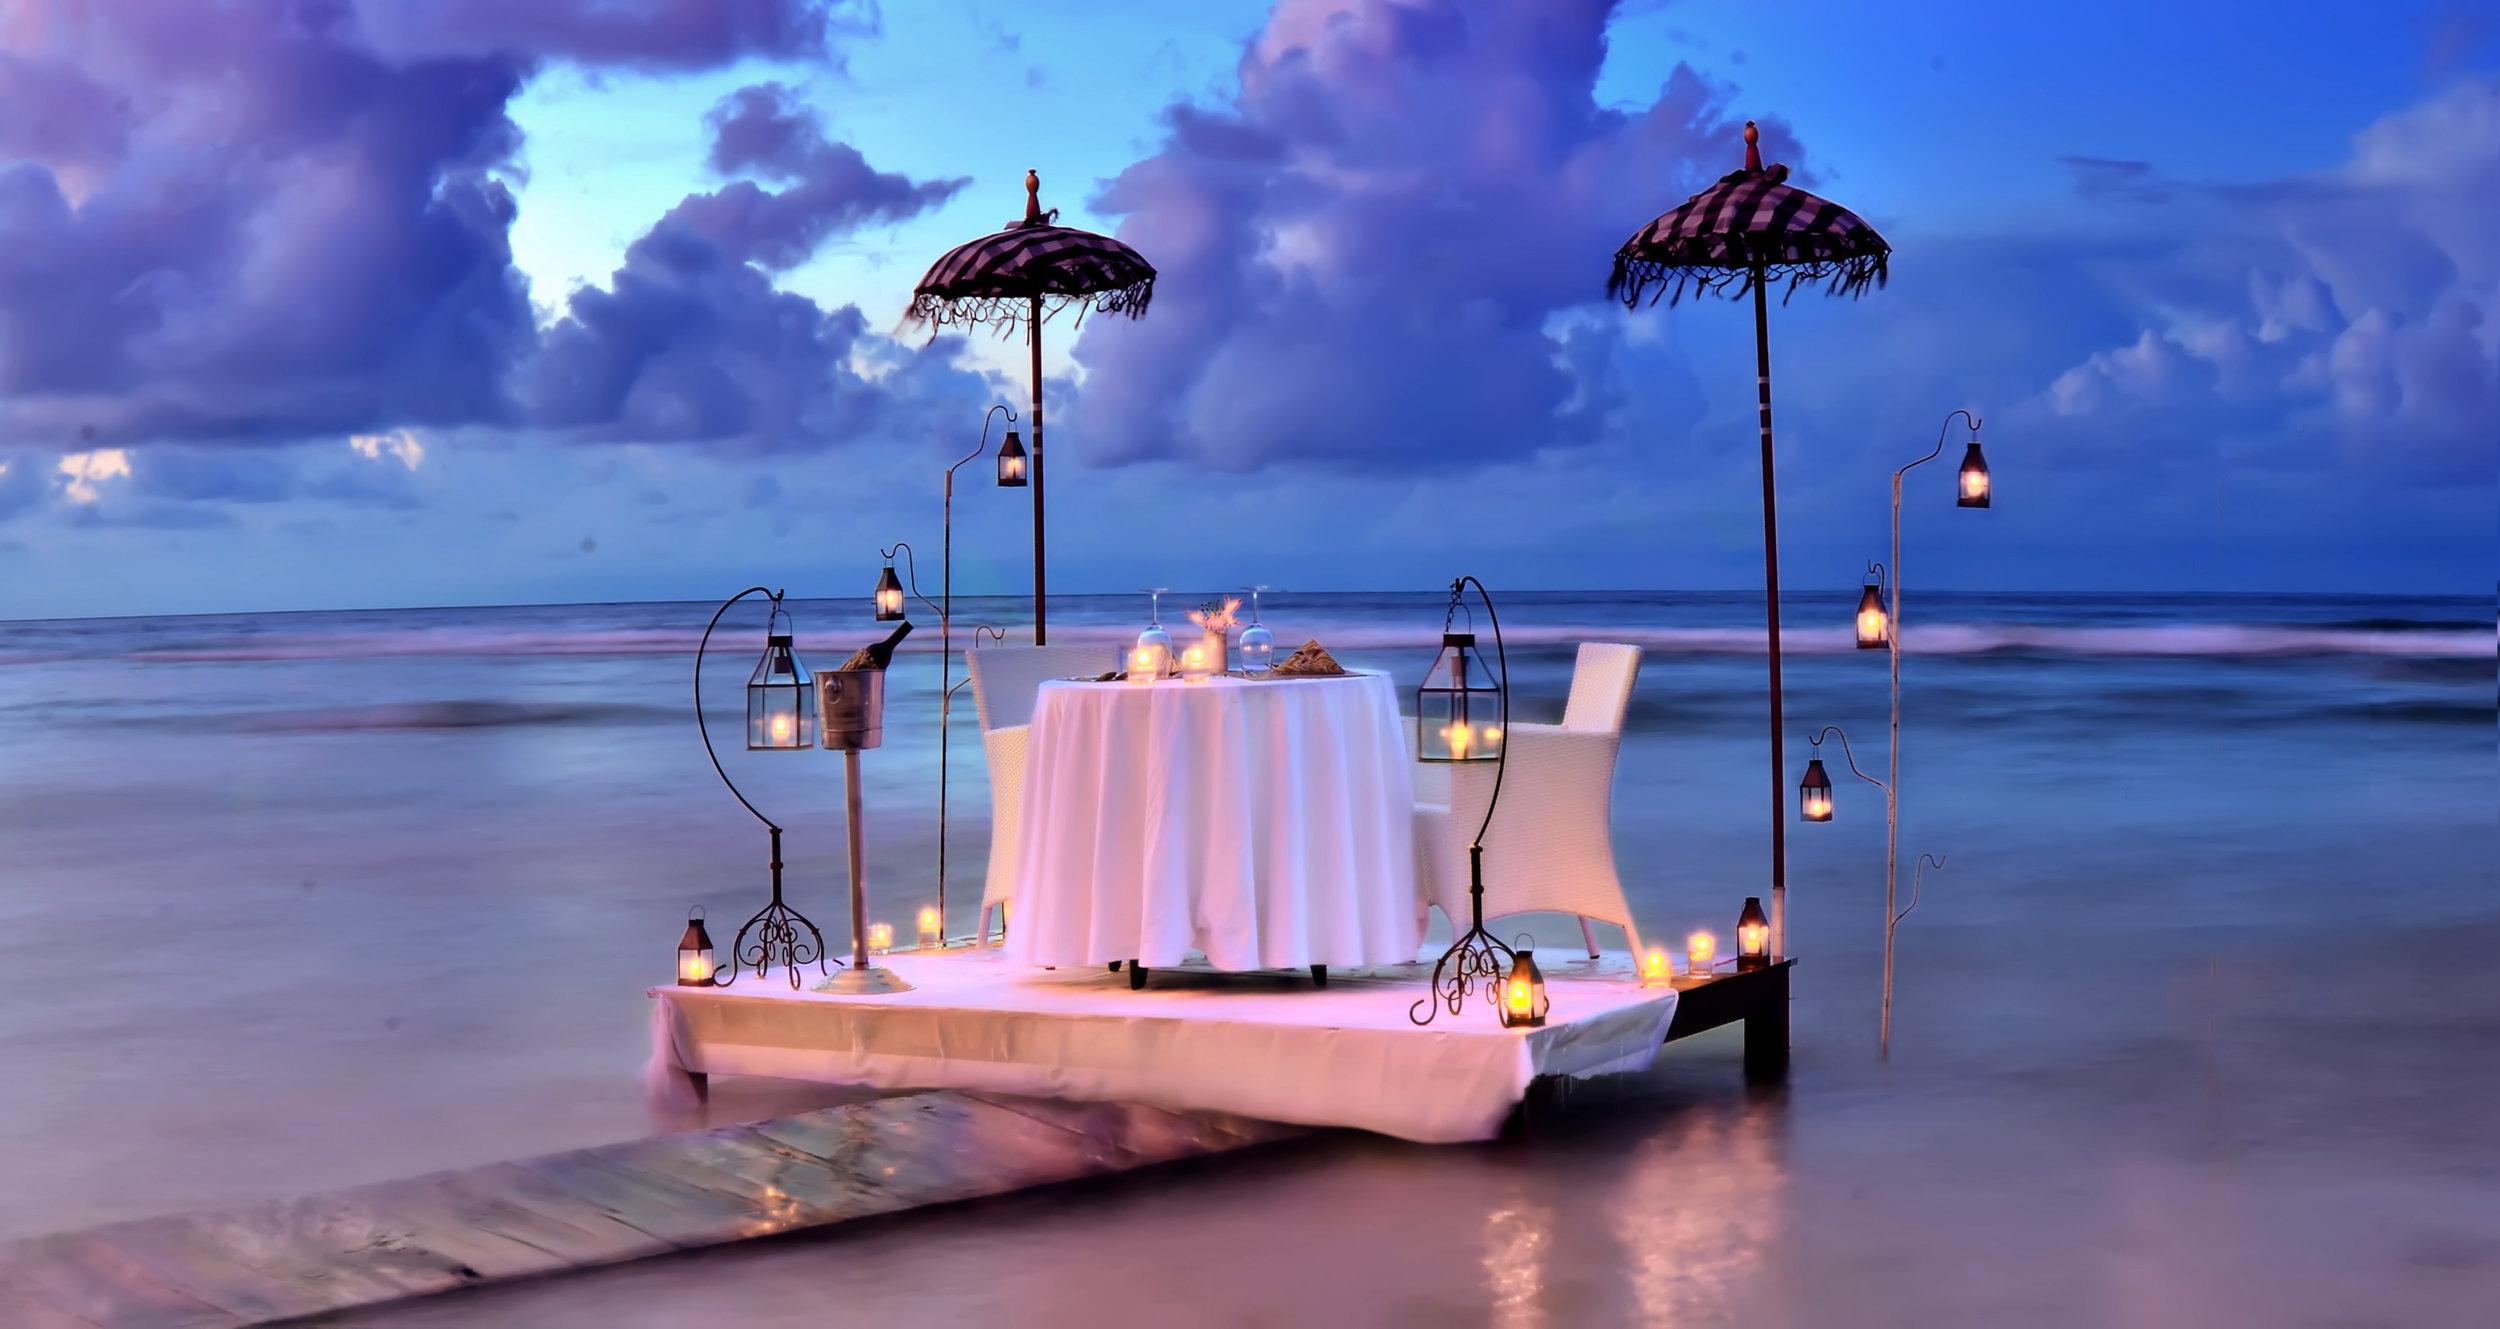 Jambuluwuk Oceano Resort - DSC_7617 edit3.jpg